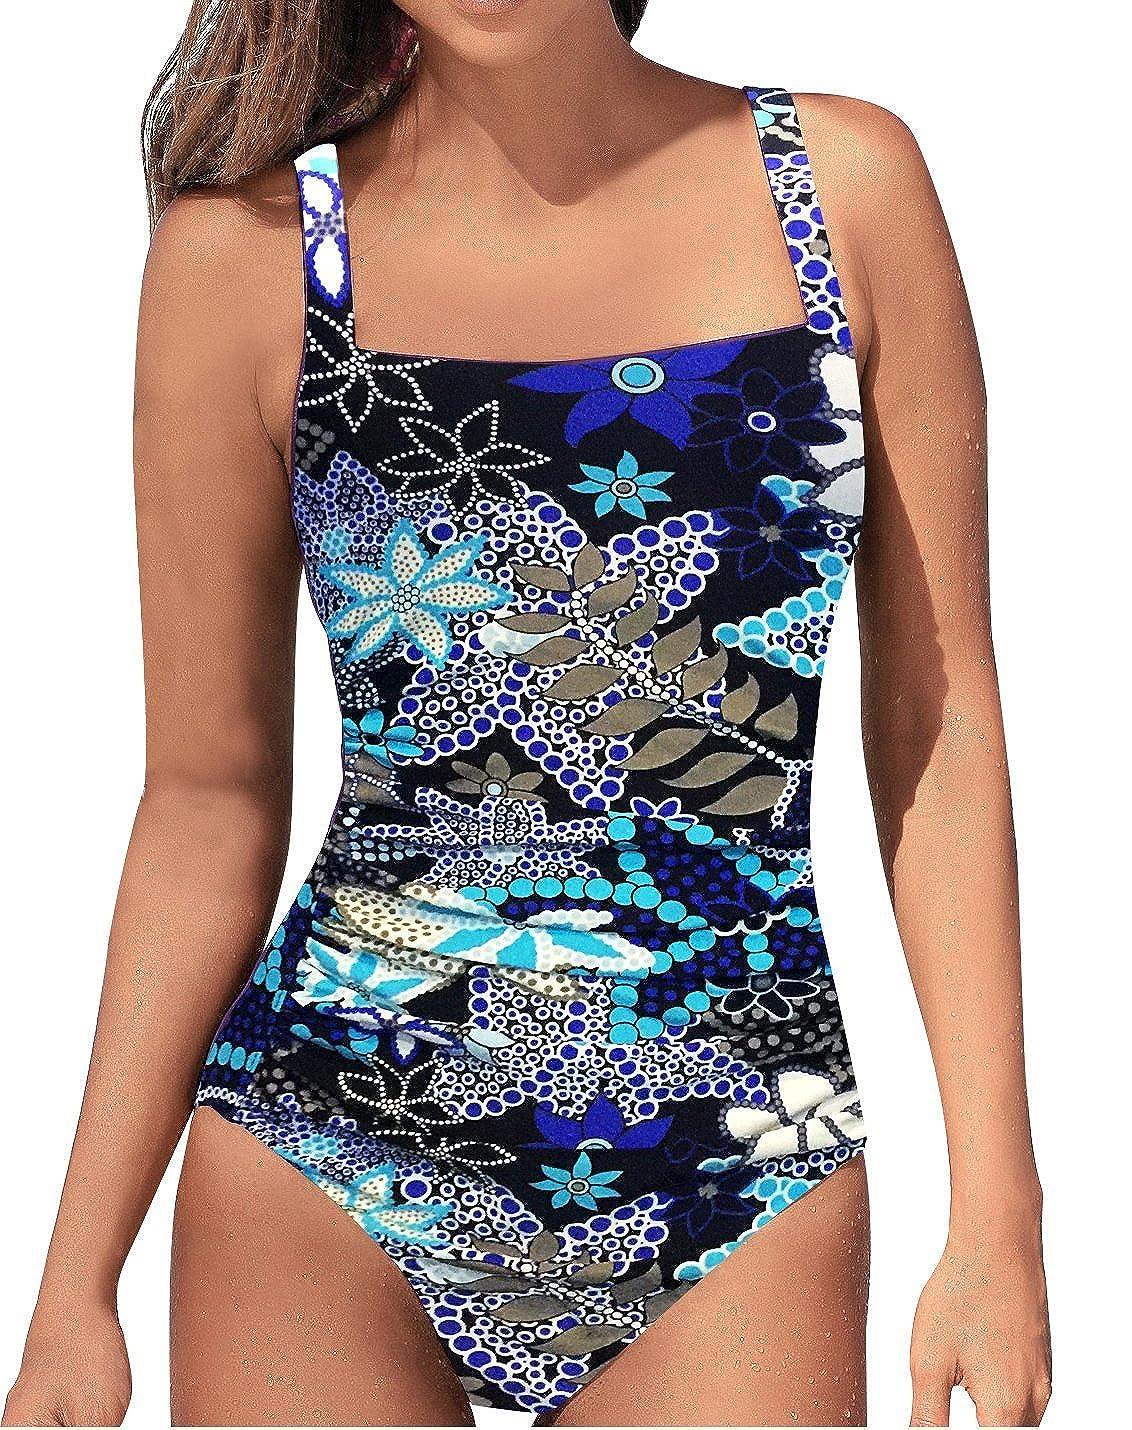 976fcc5426 Women\'s Vintage Tummy Control One Piece Swimsuits Monokini Push Up Bathing  Suits Plus Size Swimwear